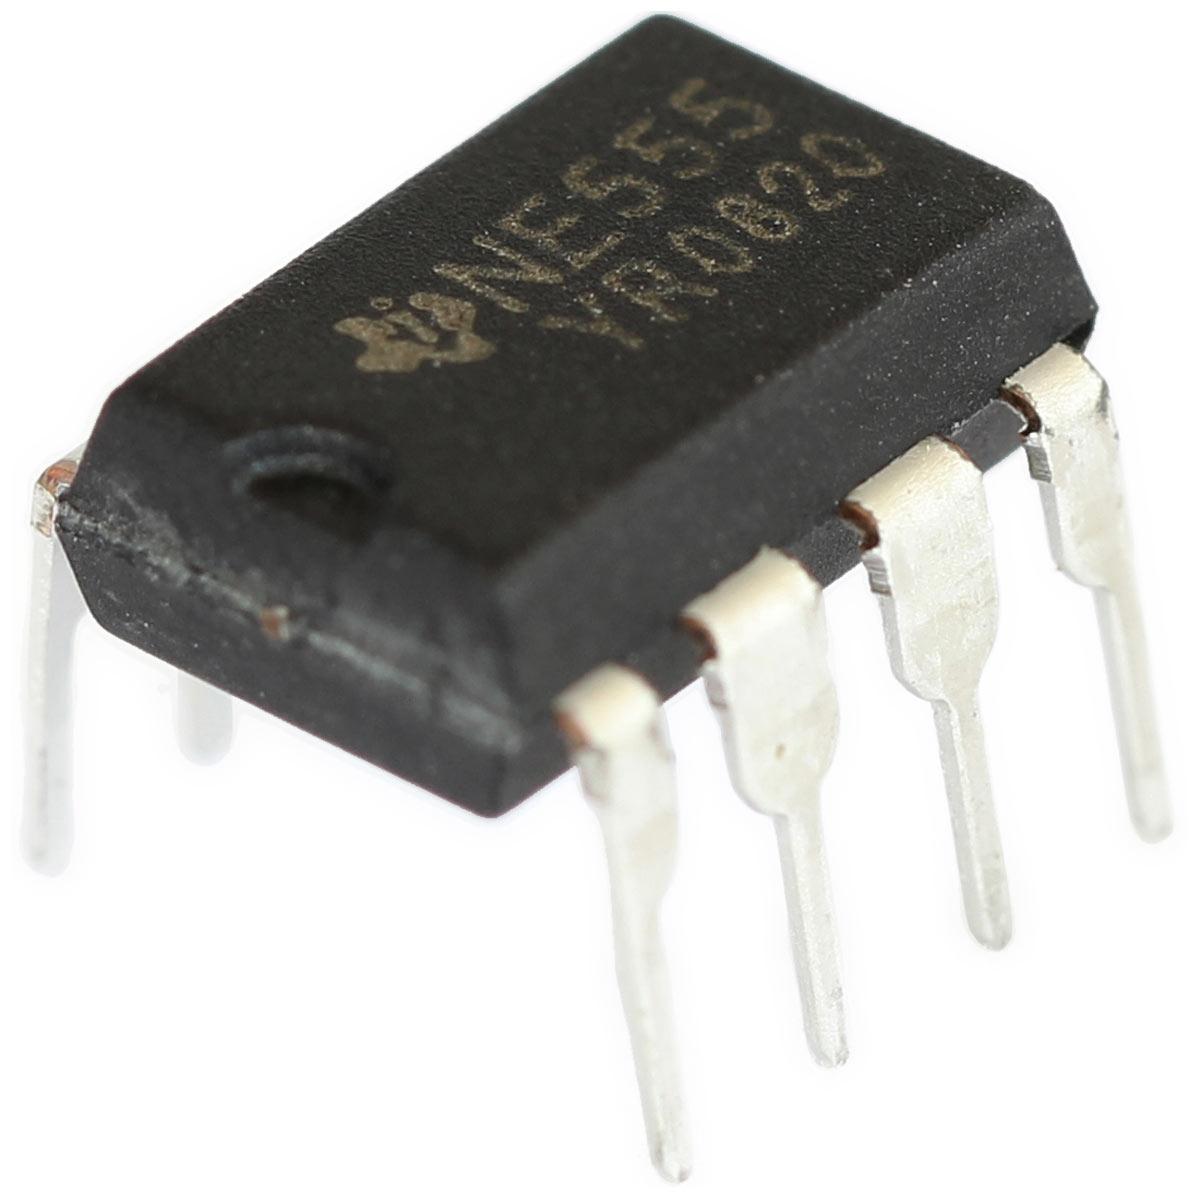 Ne555 General Purpose Single Bipolar Timer Protostack Lm741hc Operational Amplifier As An Astable Oscillator Circuit Output